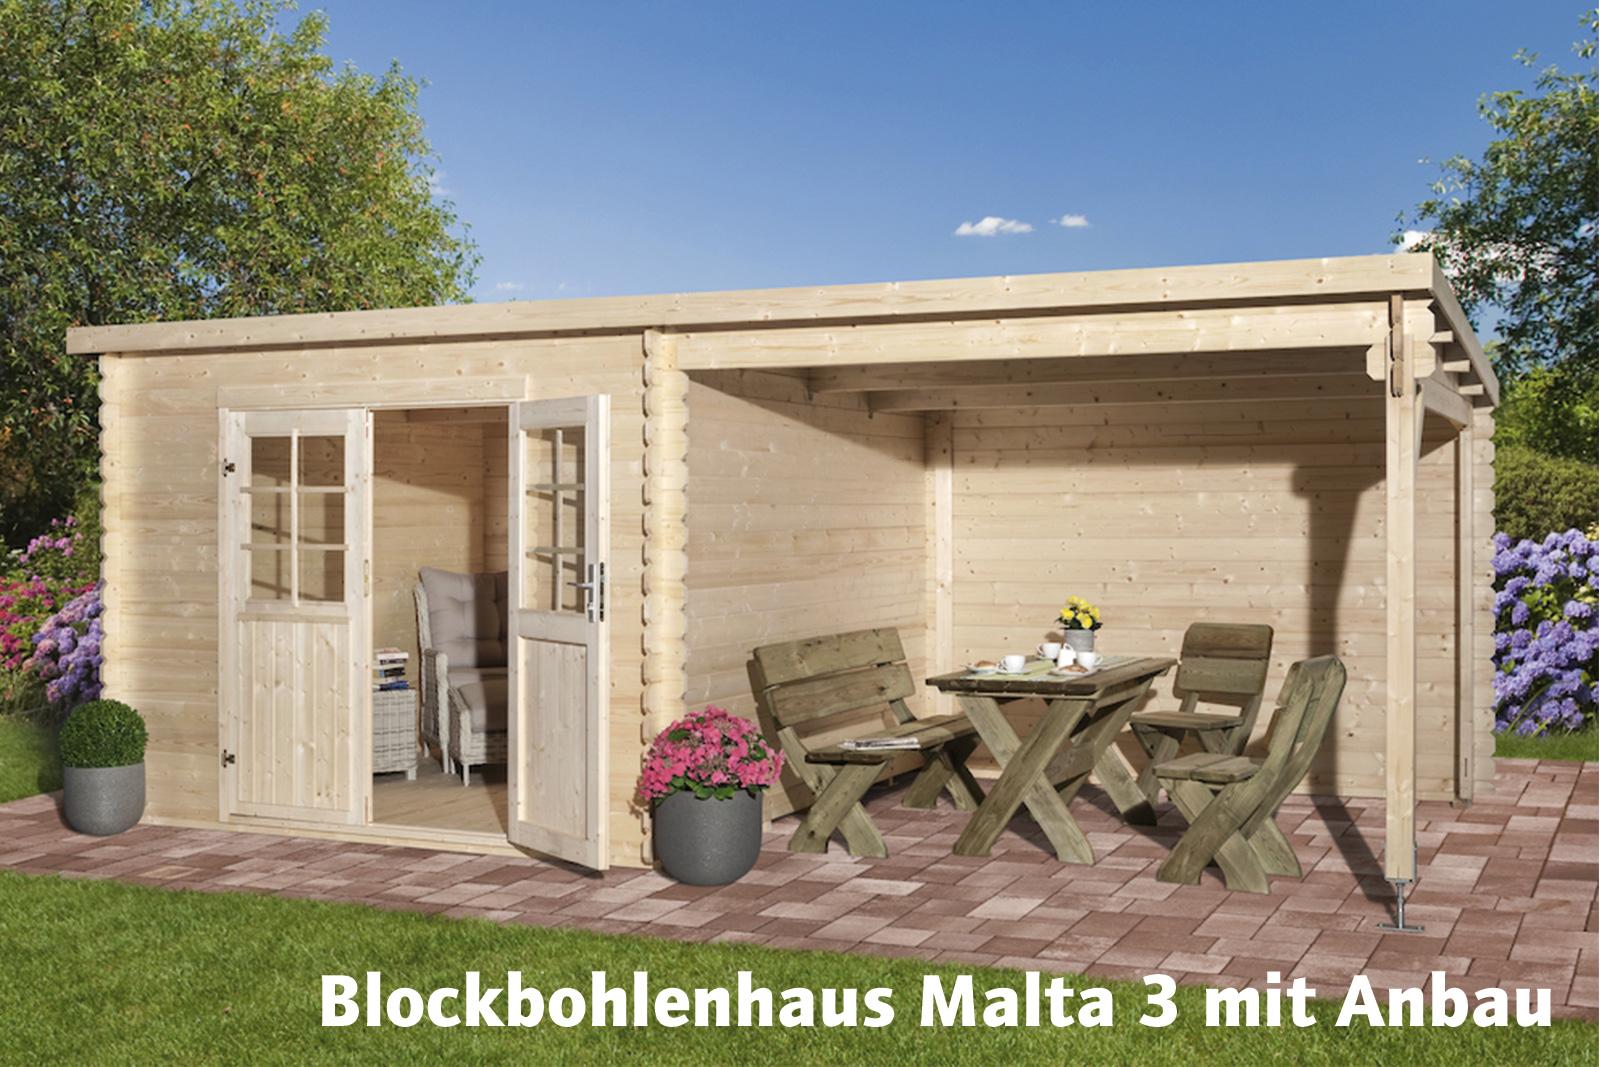 gartenhaus malta 3 my blog. Black Bedroom Furniture Sets. Home Design Ideas